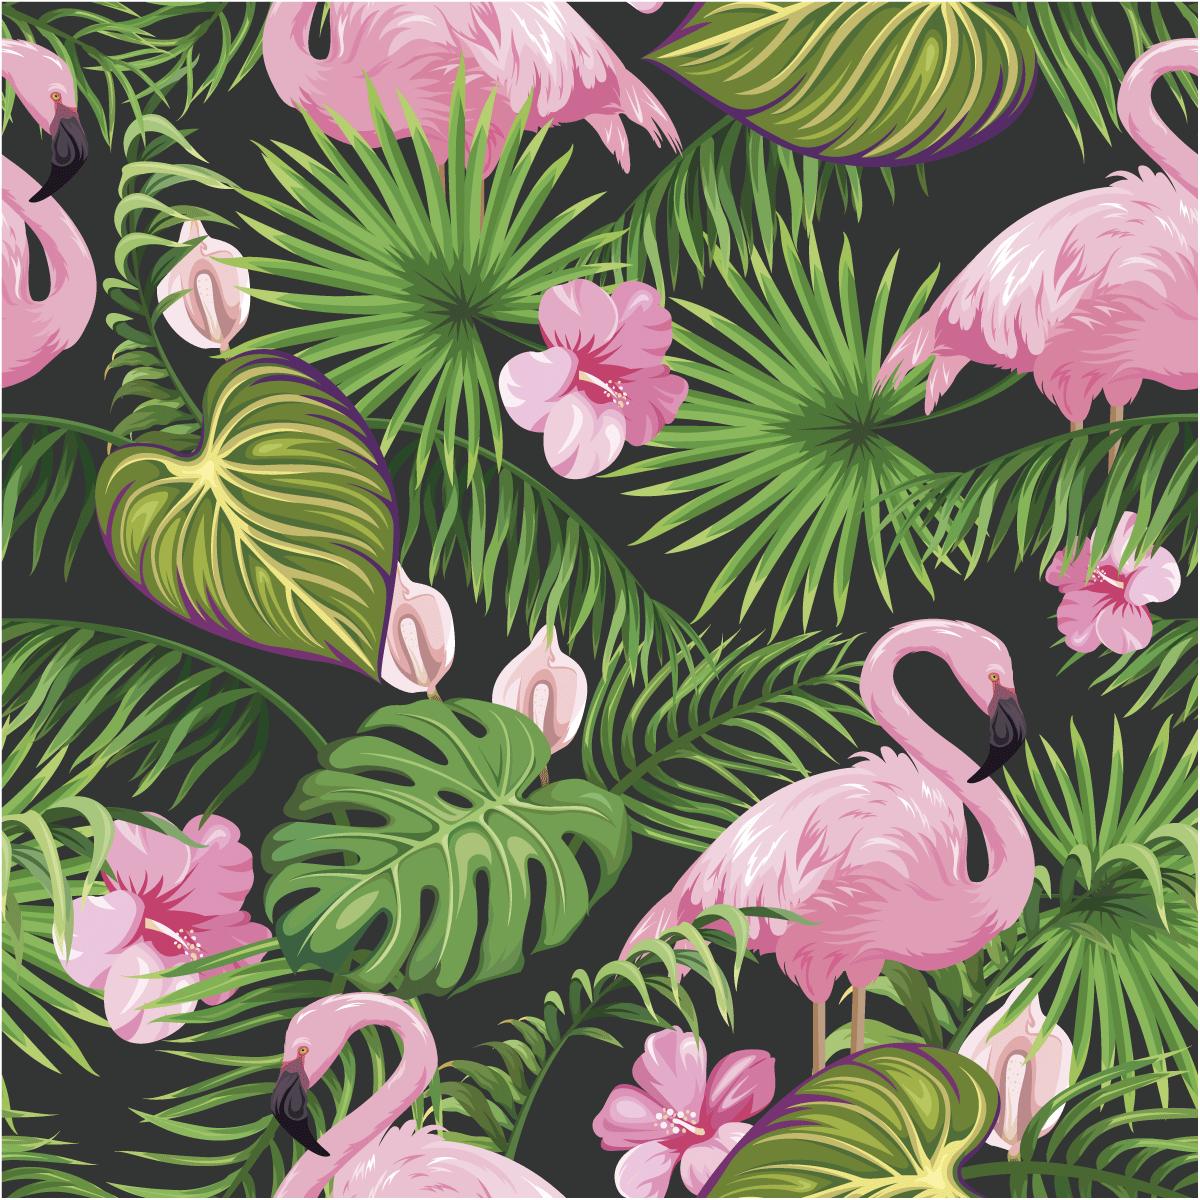 Sticker Papier Peint Tropical Sacaba Nature Fleurs Ambiance Sticker